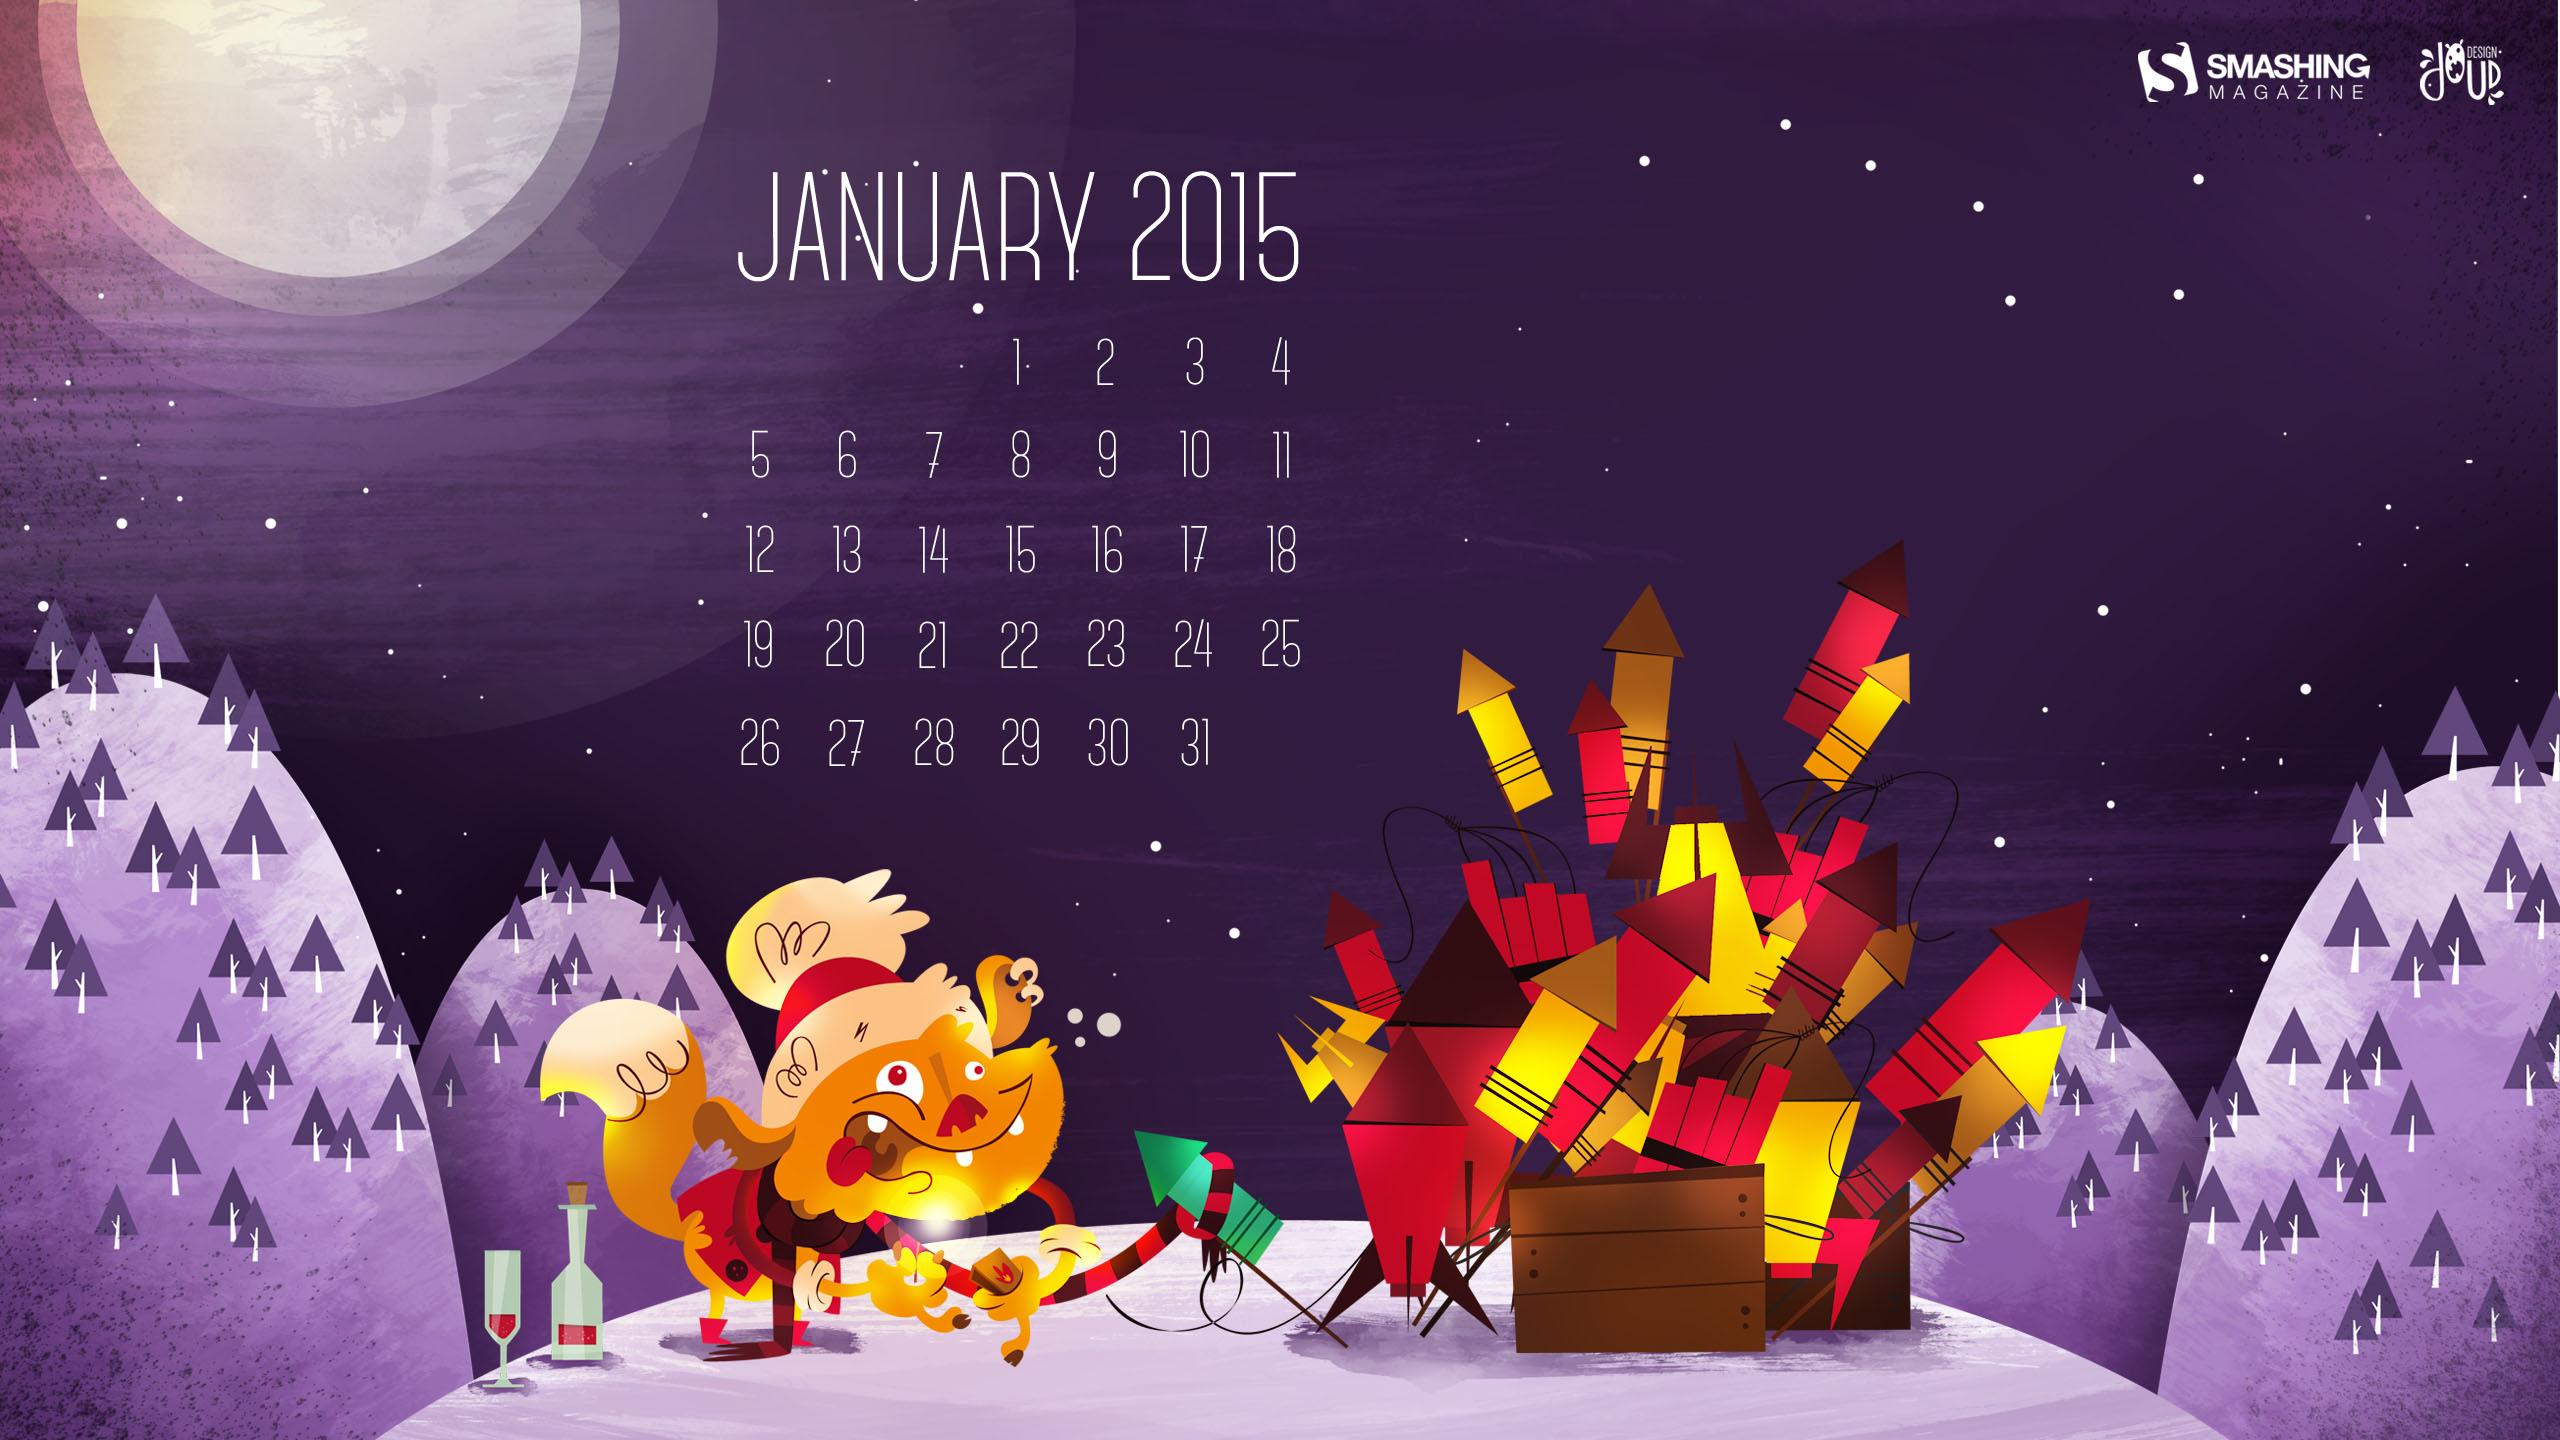 Desktop Wallpaper Calendars: January 2015 – Smashing Magazine